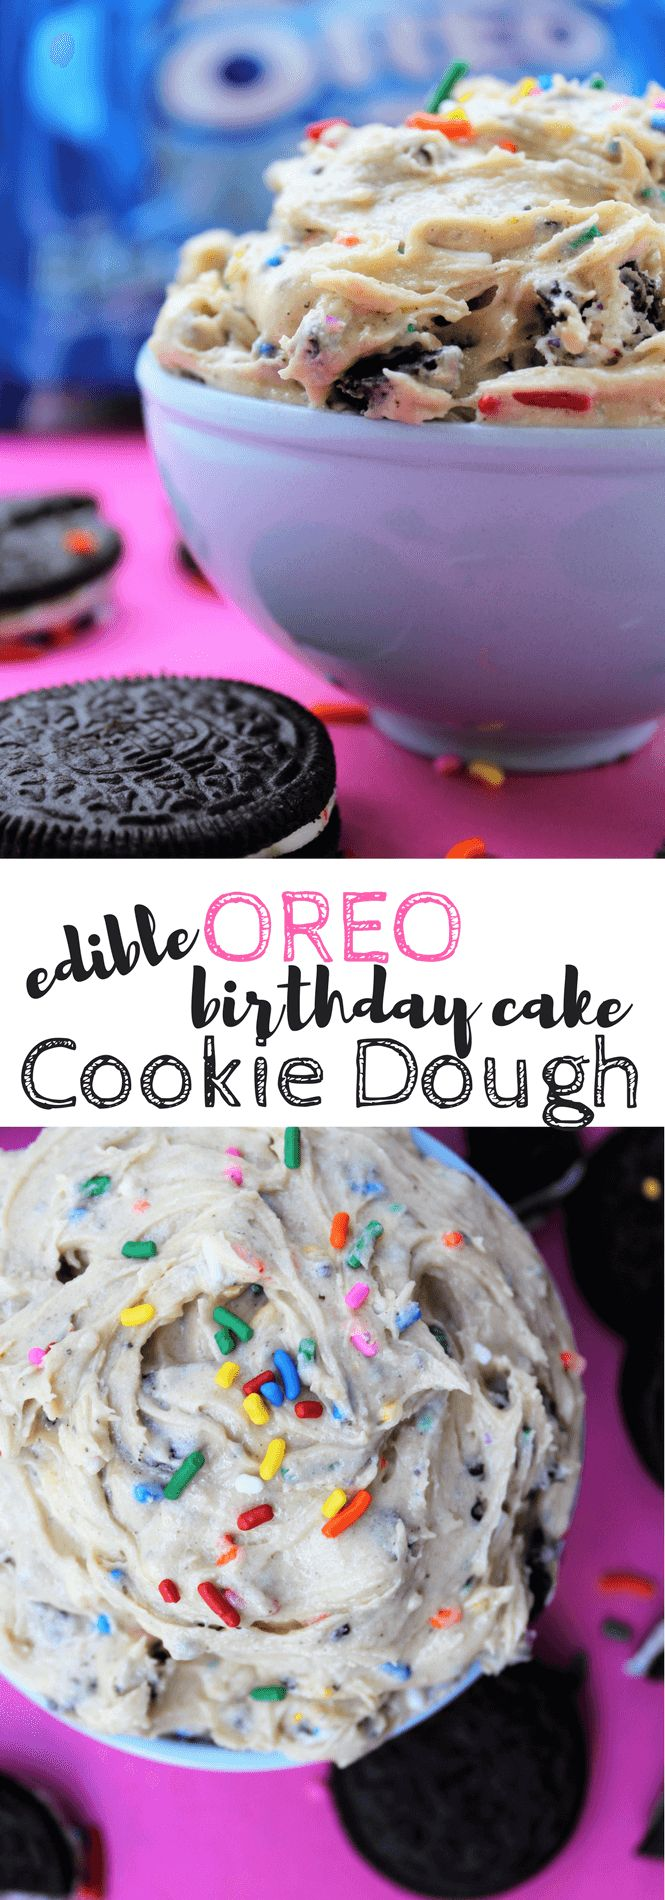 Edible OREOBirthday CakeCookie Dough  – Leggings 'N' Lattes Contributor